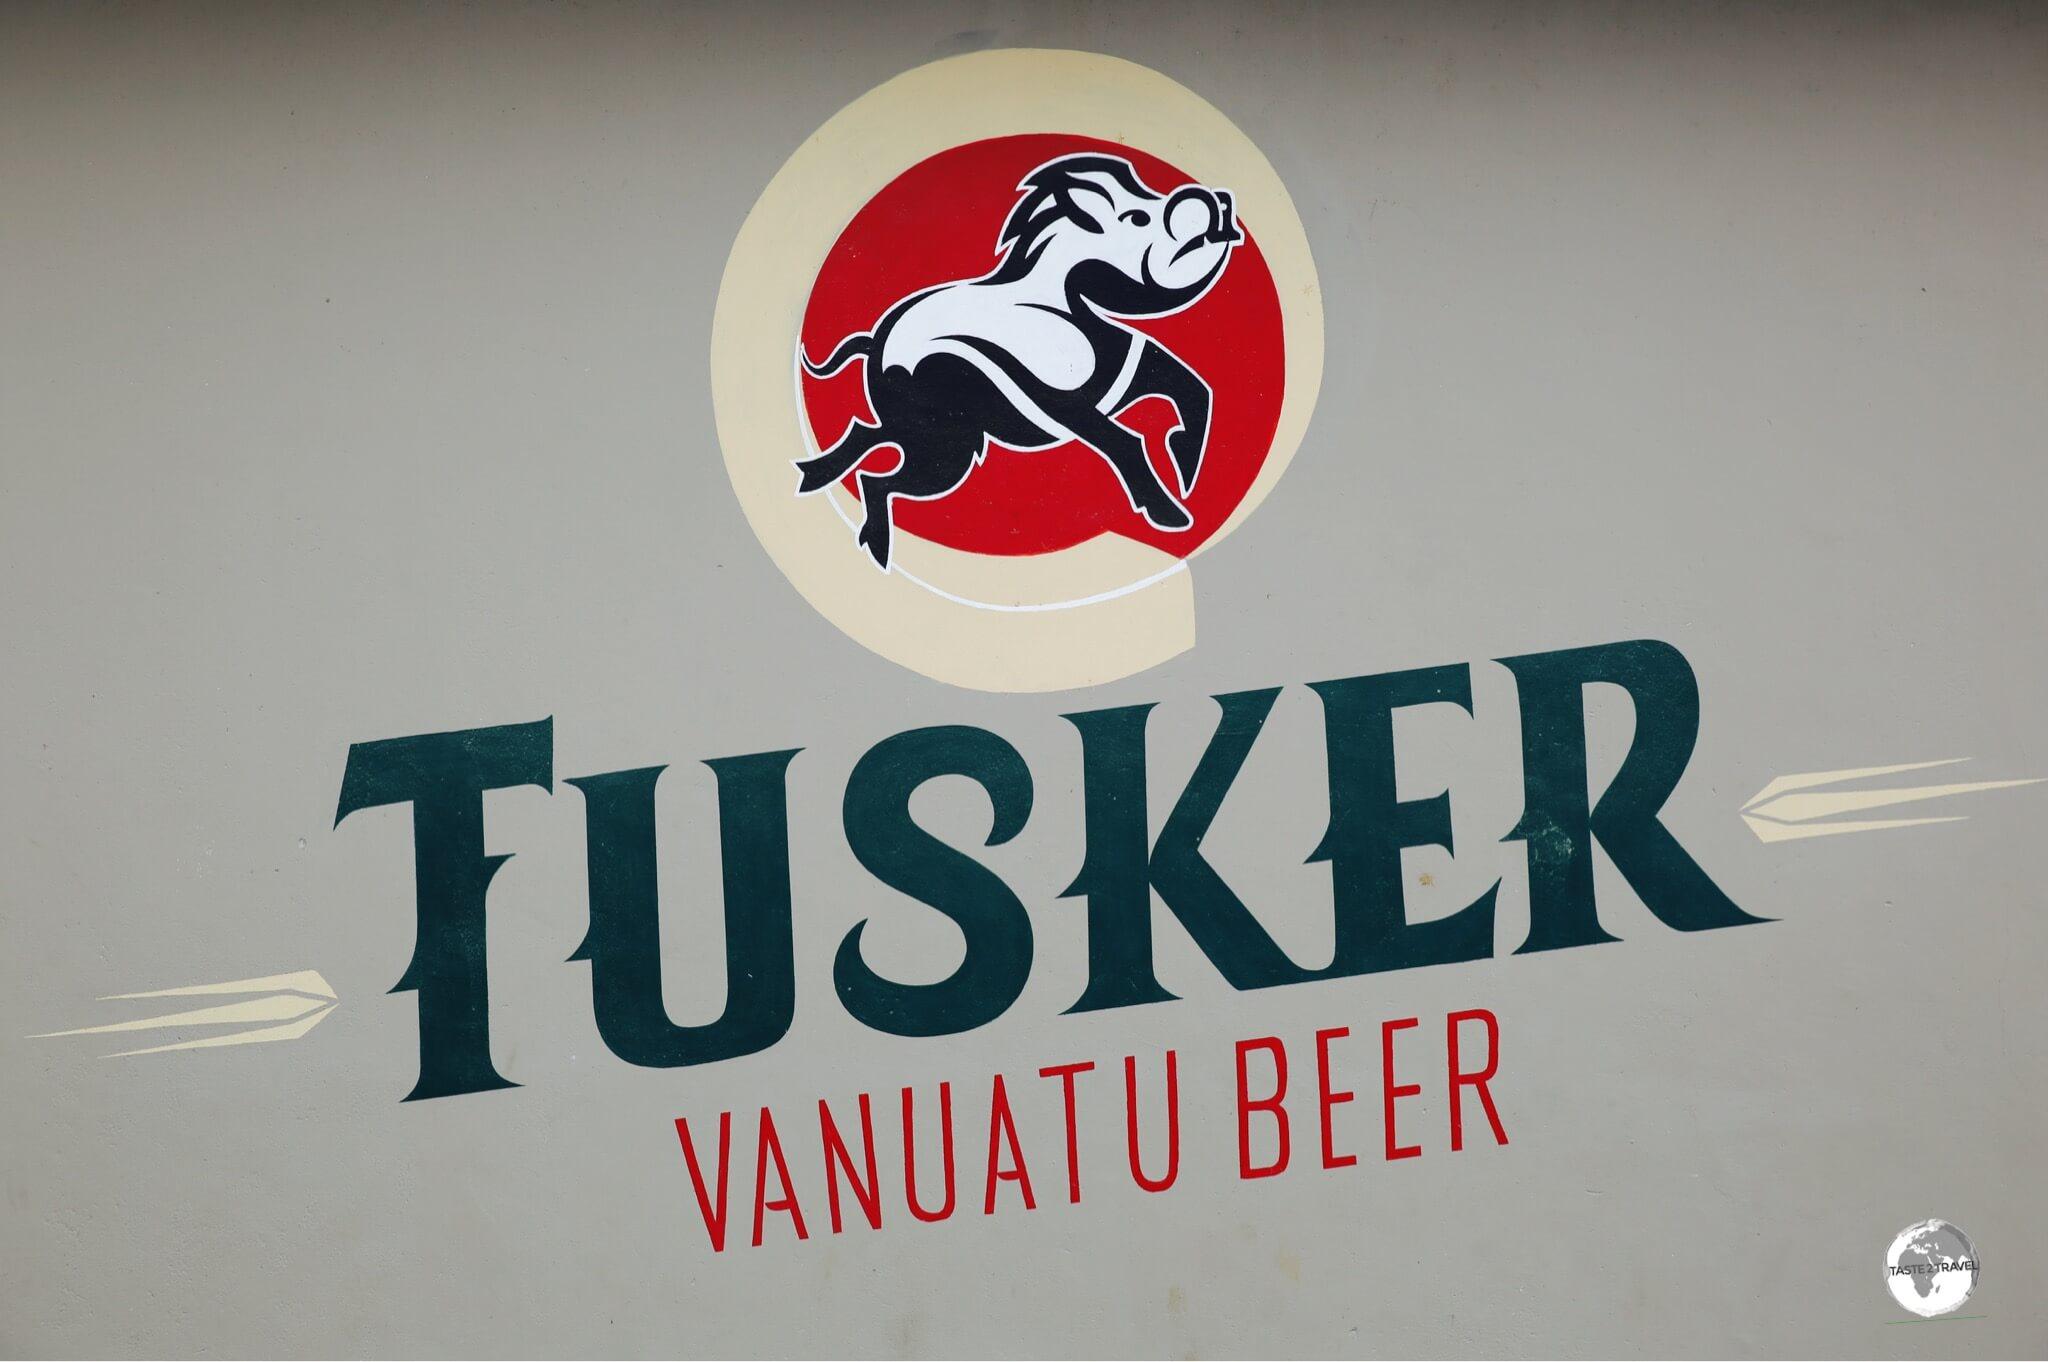 A Tusker Beer advertisement in Port Vila.